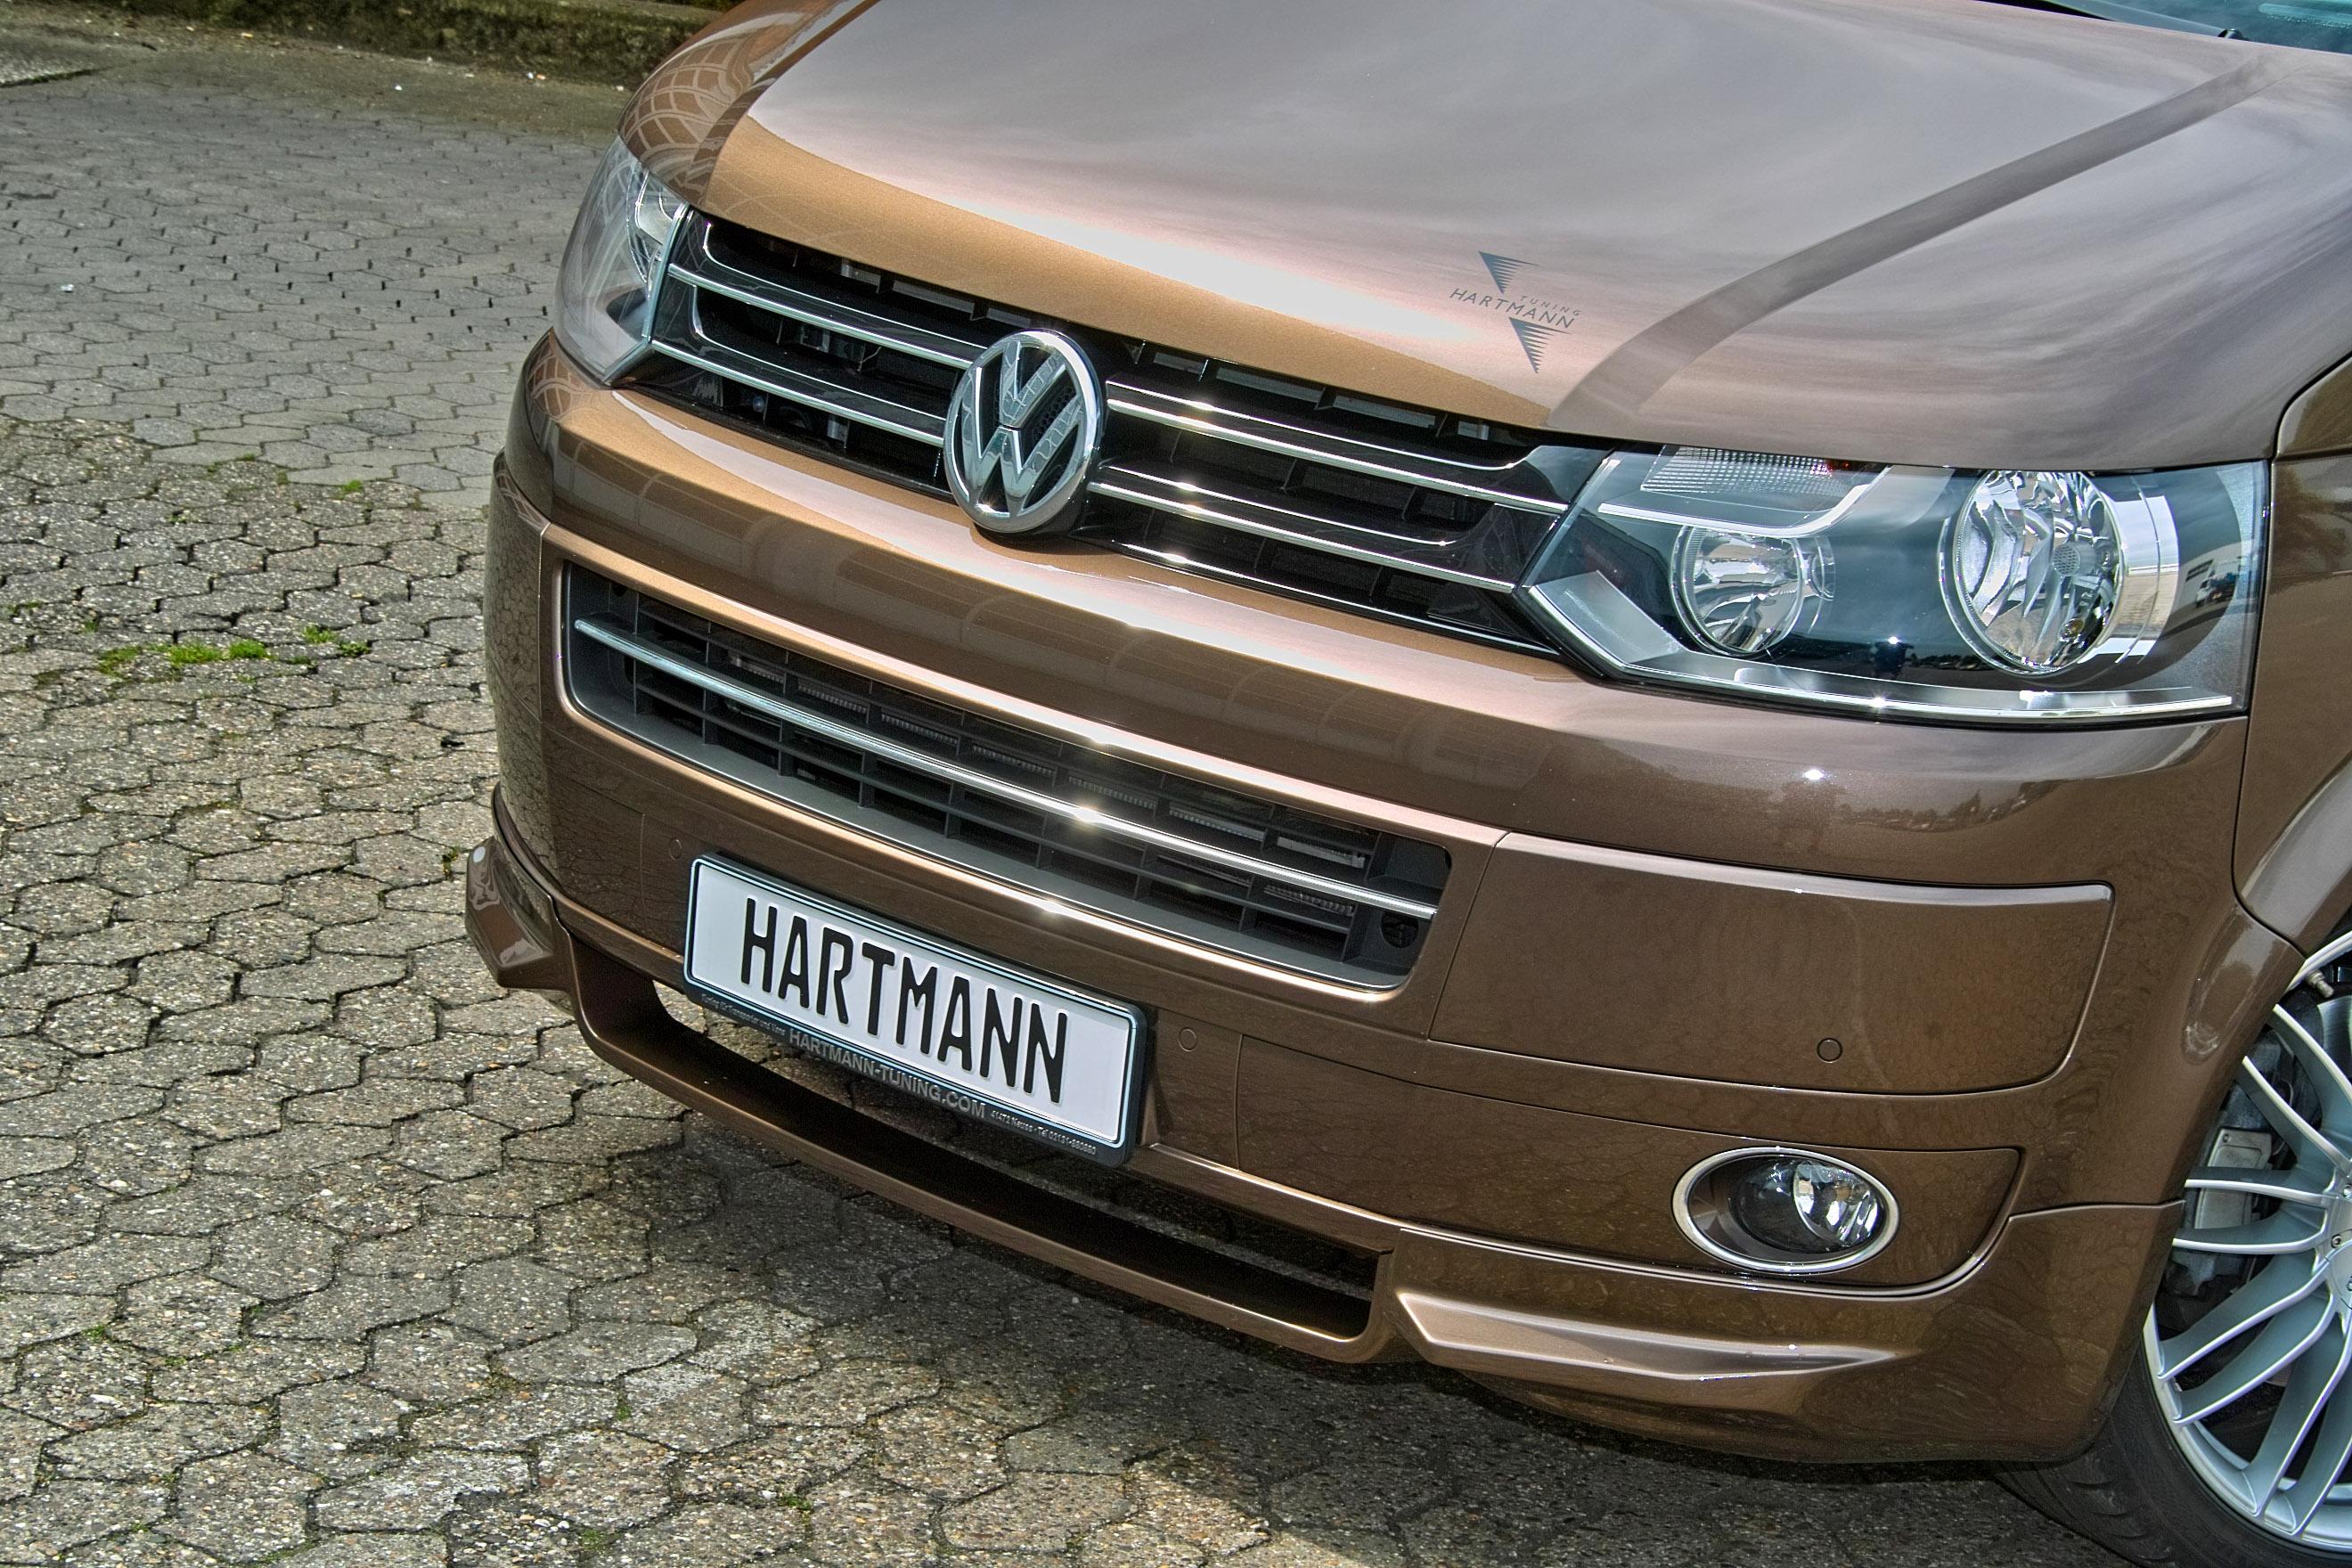 hartmann-vansports-t5-tuning-004